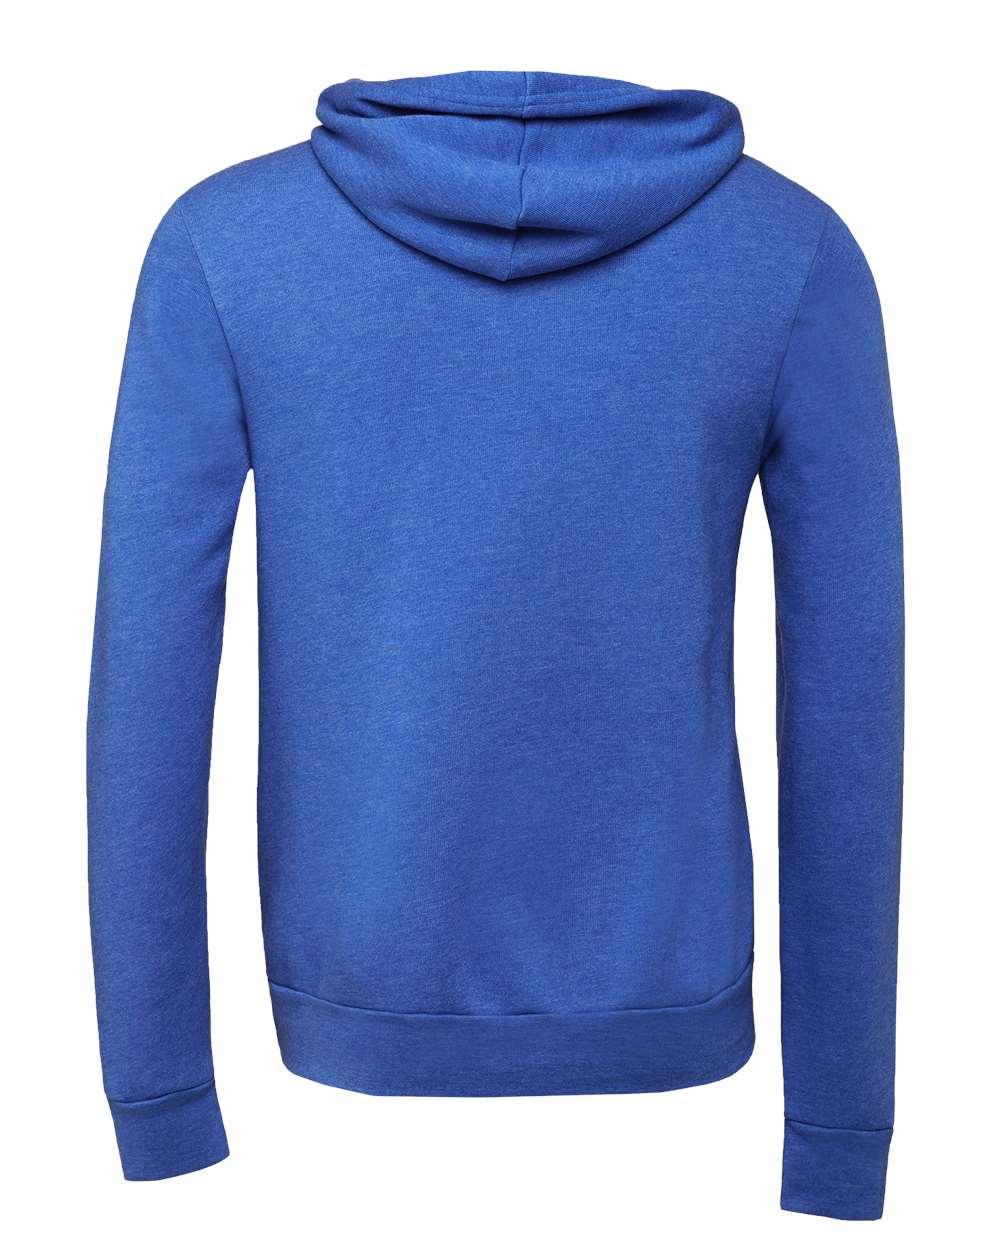 Bella-Canvas-Unisex-Sponge-Hooded-Pullover-Sweatshirt-Blank-3719-up-to-2XL thumbnail 64